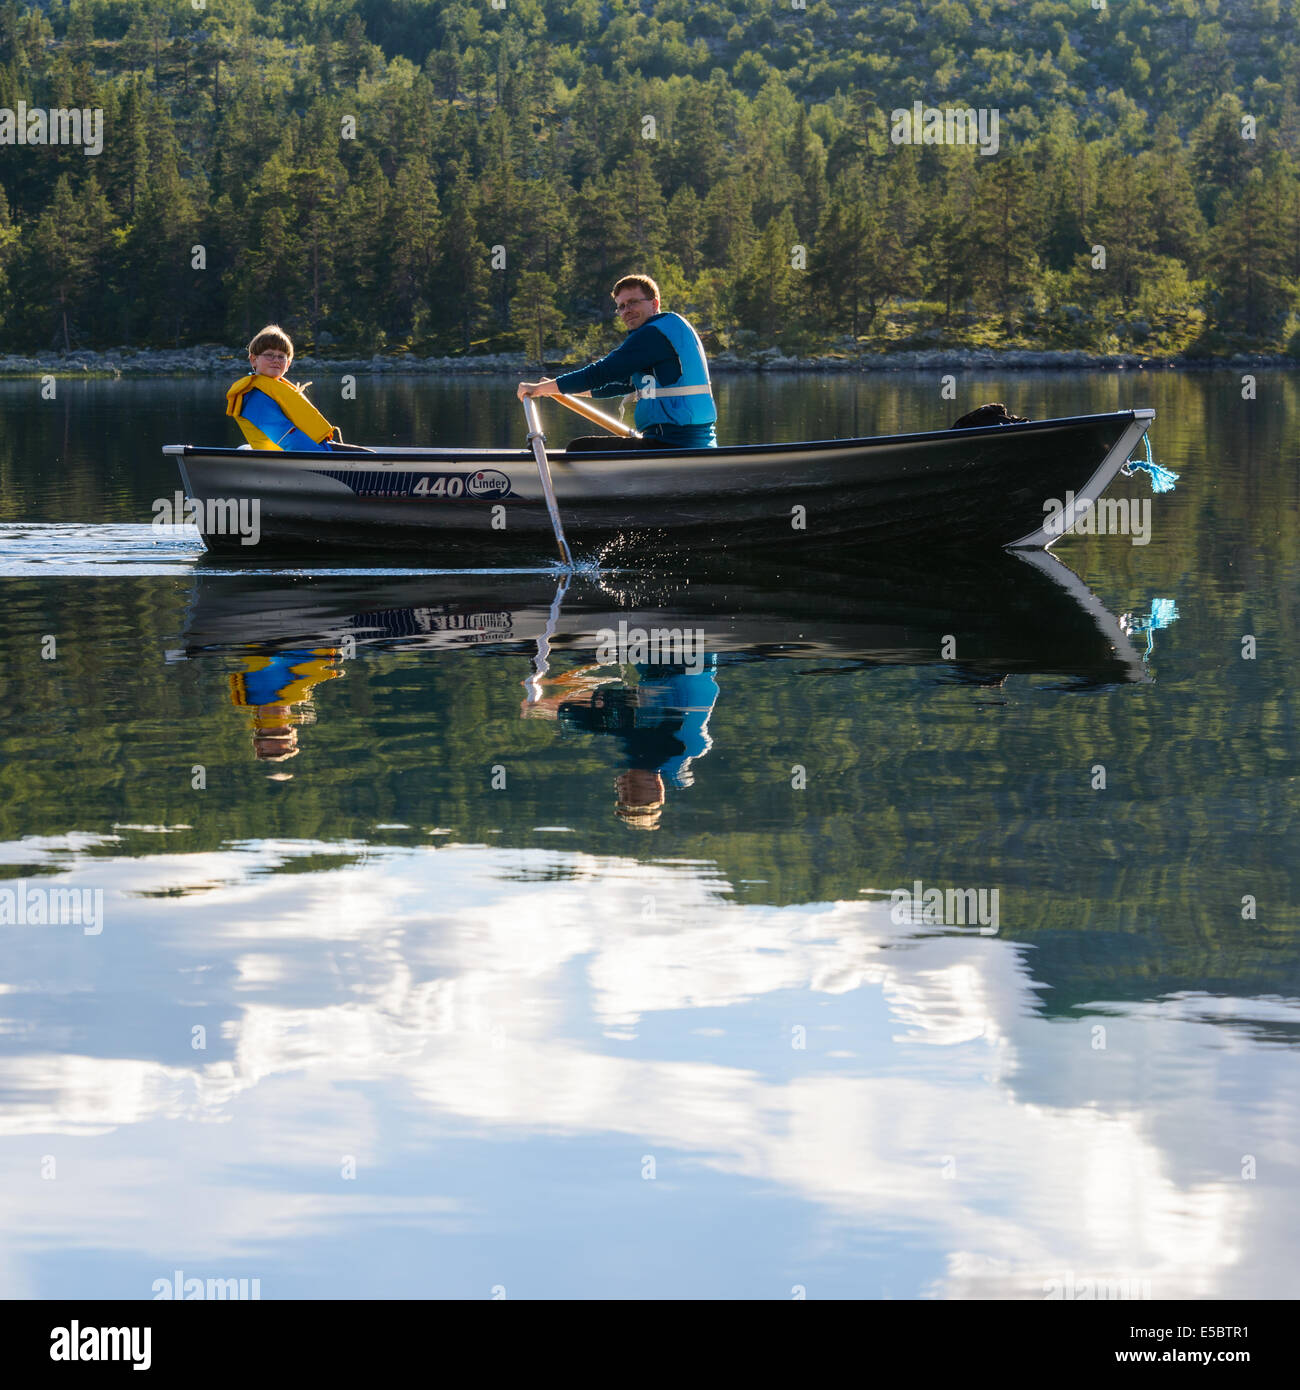 Two people rowing a small boat on lake, Dalarna - Stock Image